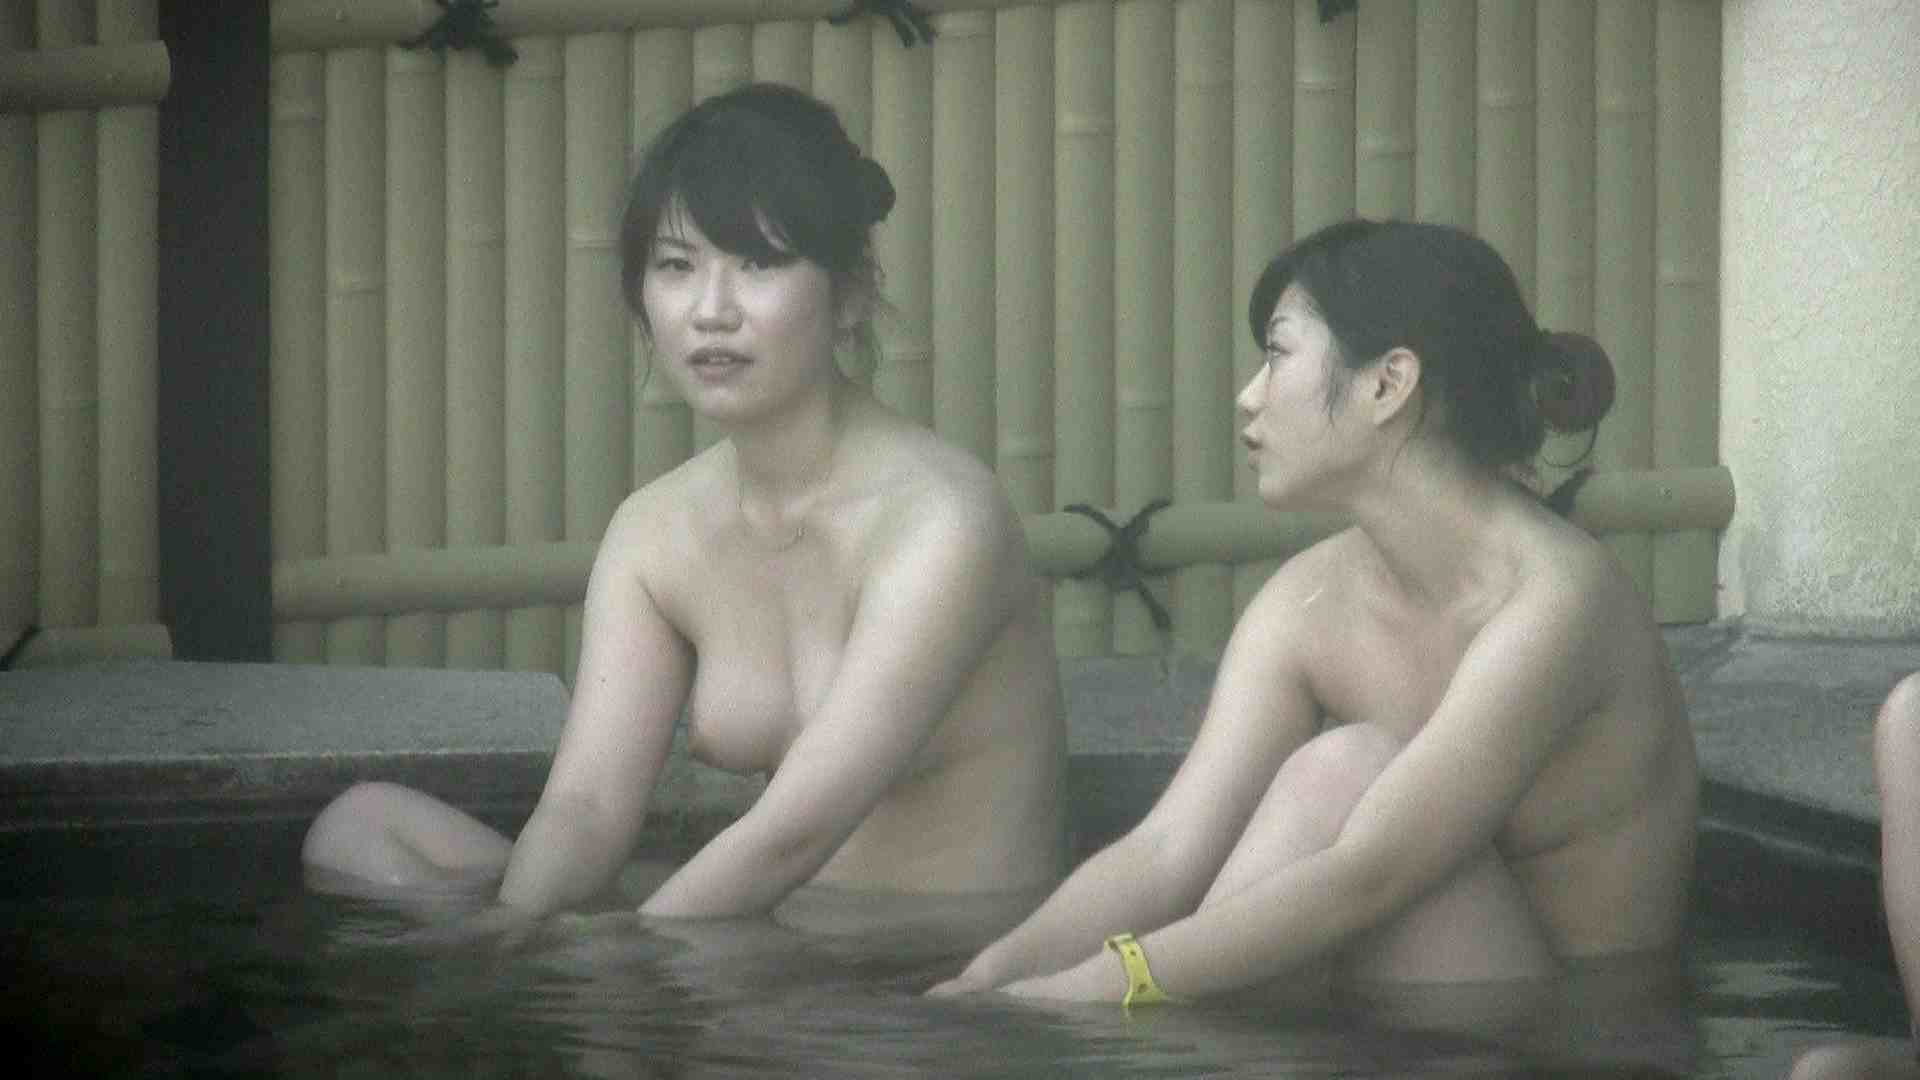 Aquaな露天風呂Vol.206 盗撮シリーズ | 露天風呂編  80PIX 9